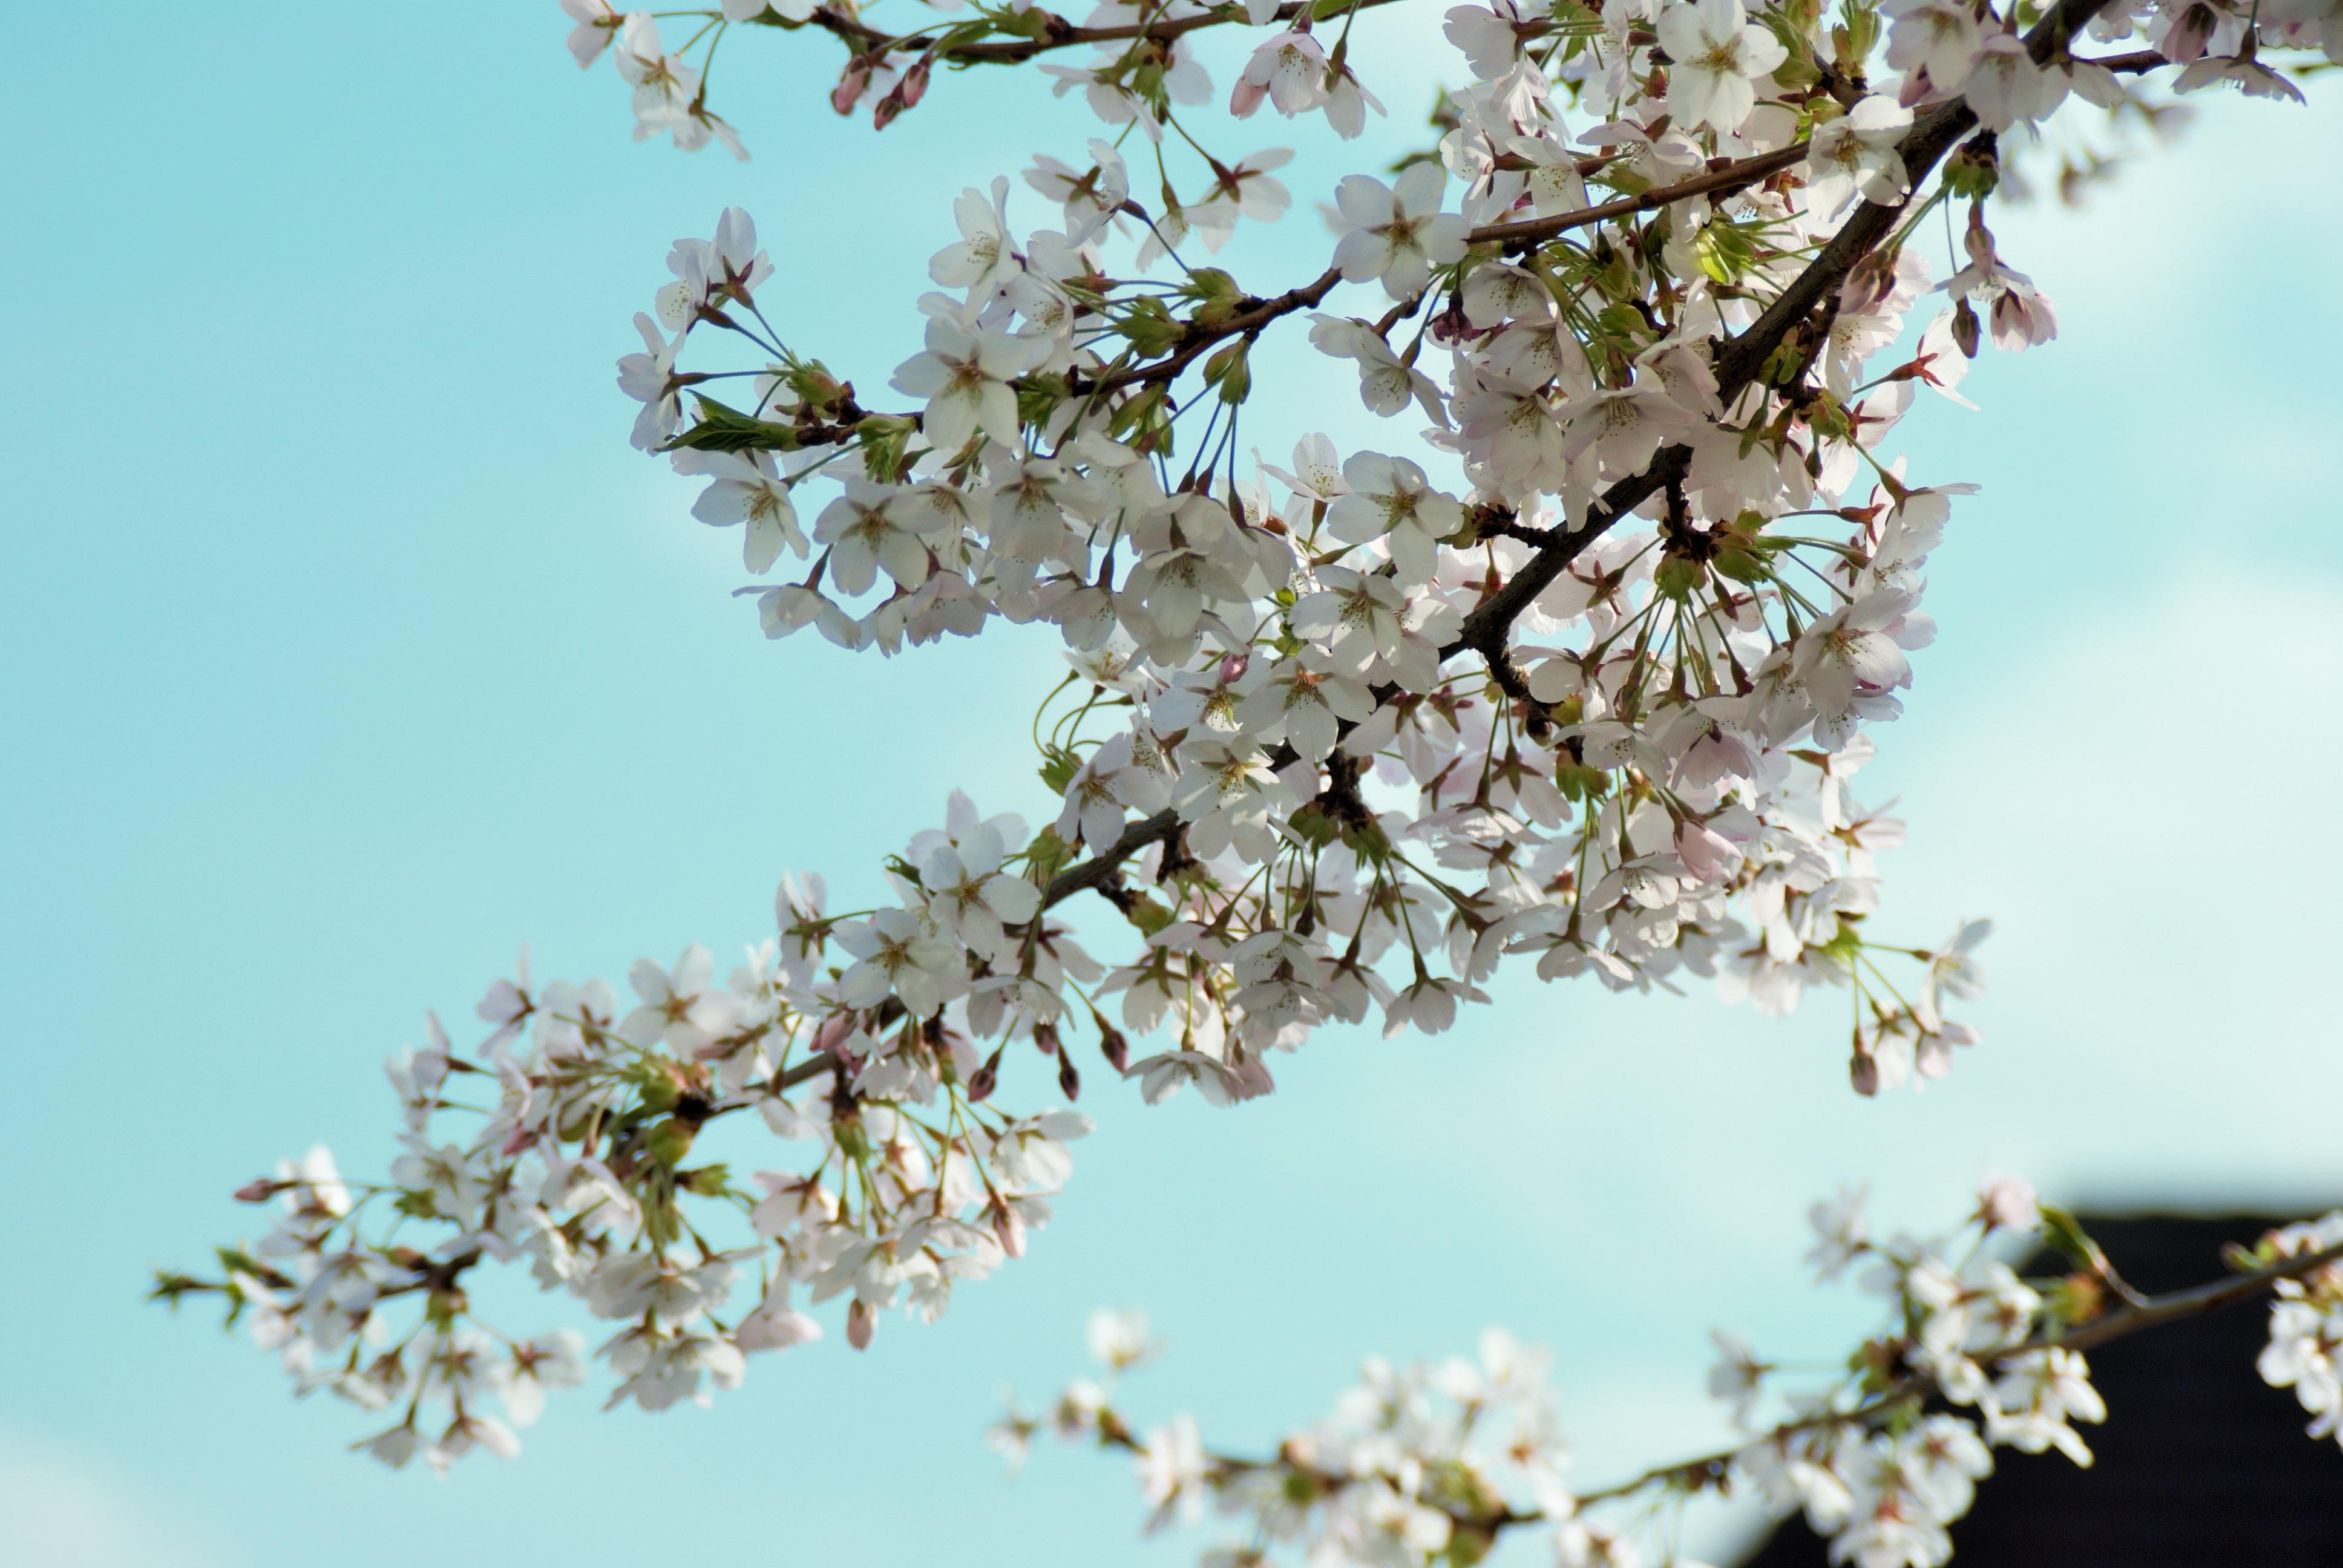 Gambar Pohon Alam Cabang Mekar Menanam Langit Daun Bunga Makanan Musim Semi Menghasilkan Botani Flora Bunga Sakura Ranting Mahkota Estetis Ceri Tanaman Berbunga 3872x2592 1221391 Galeri Foto Pxhere